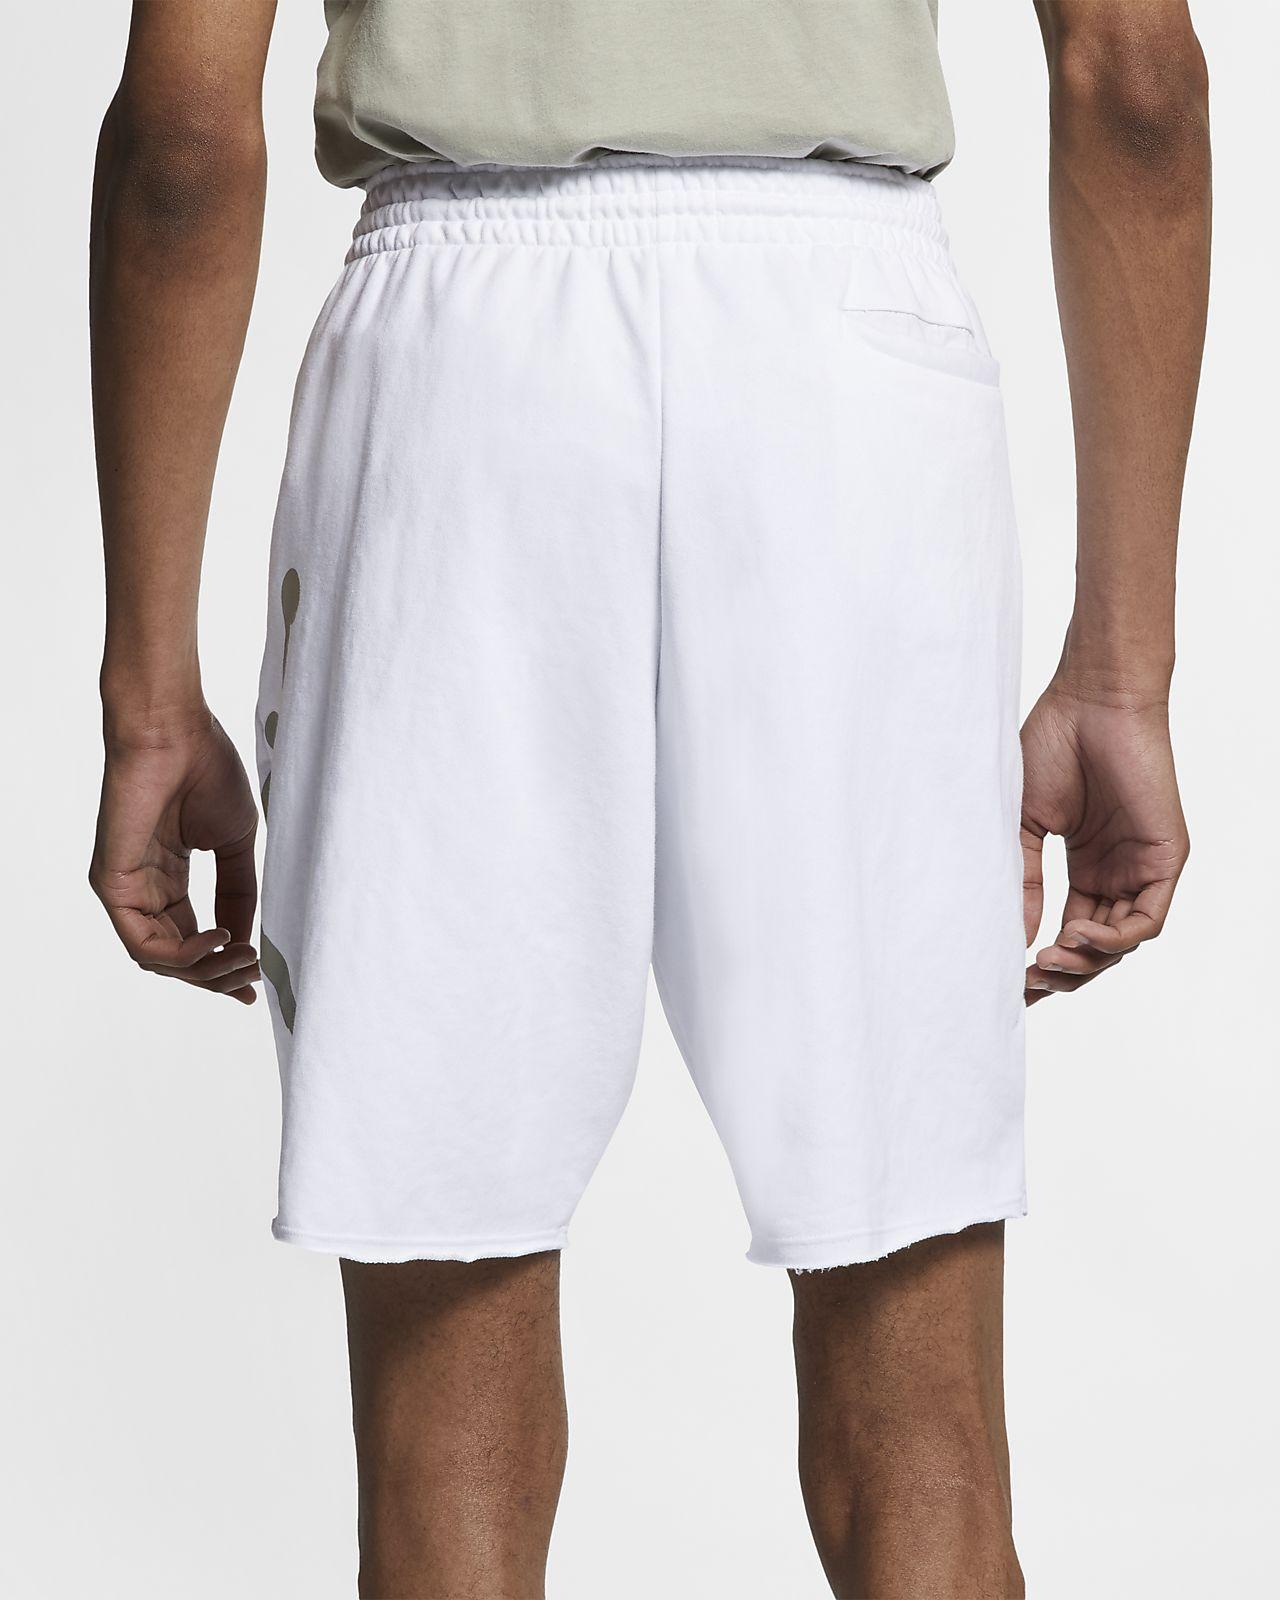 8812a8c6043 Jordan Jumpman Logo Men's Fleece Shorts. Nike.com